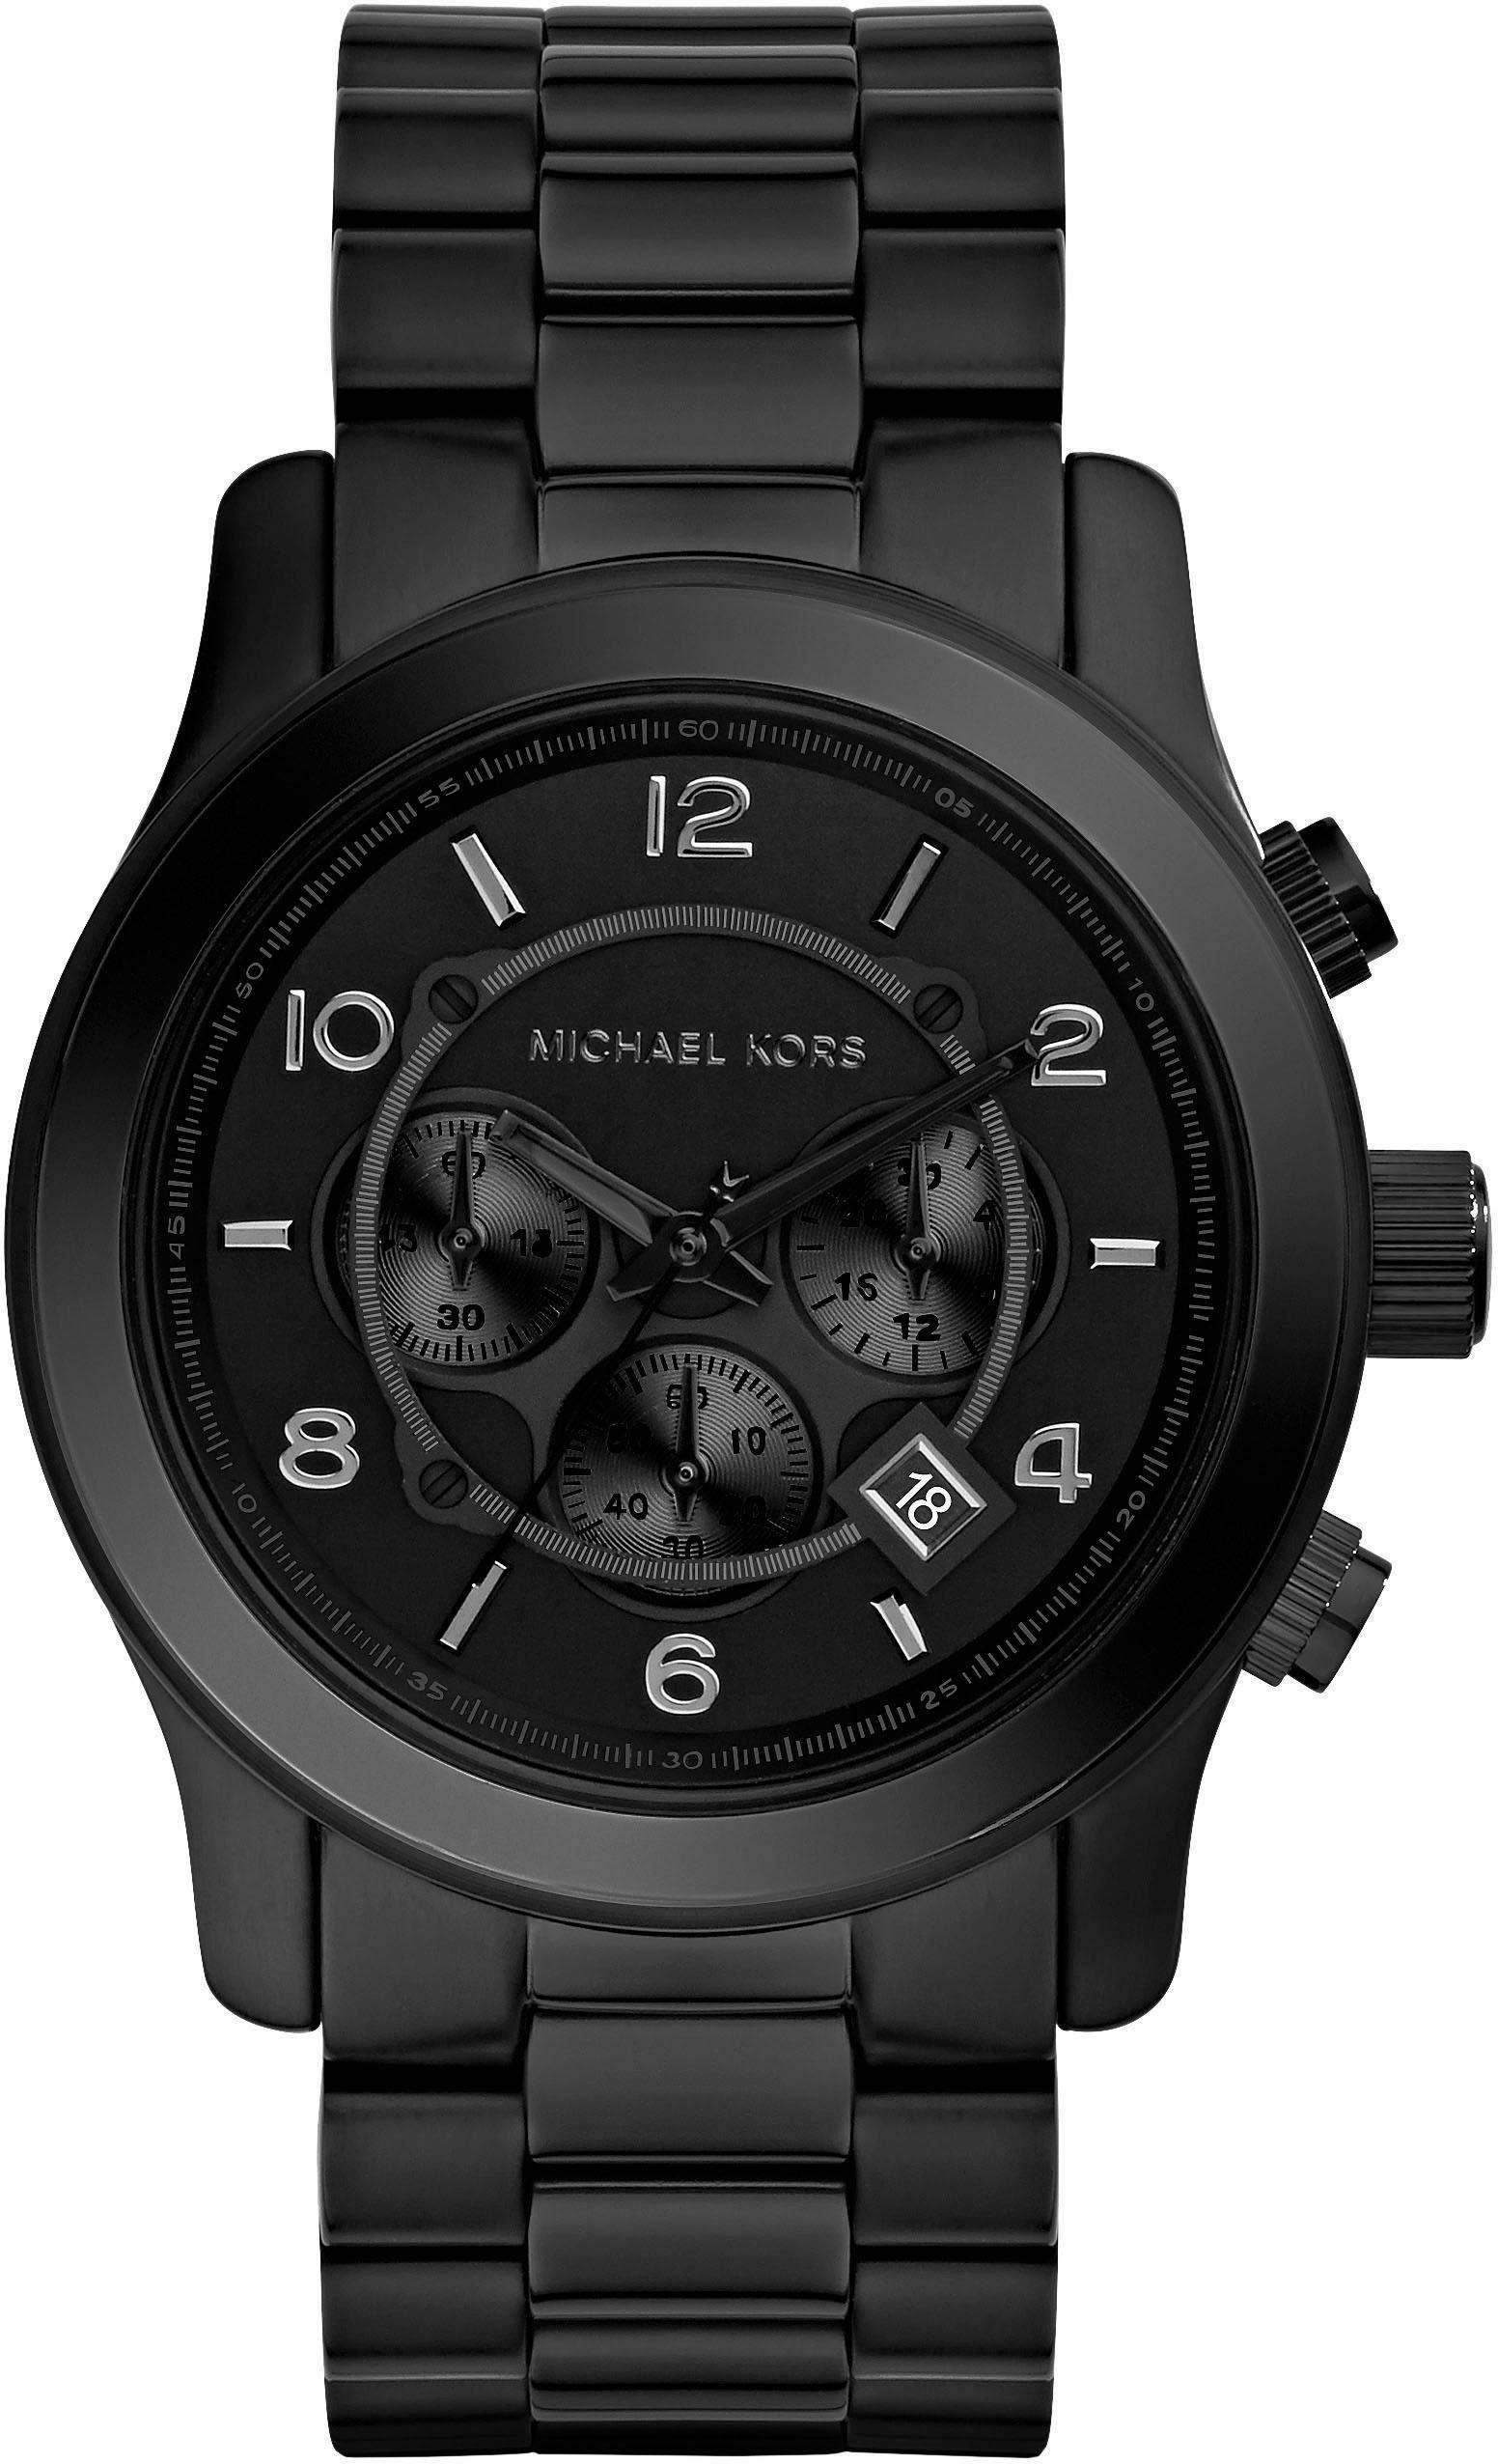 MICHAEL KORS Chronograph »RUNWAY, MK8157«